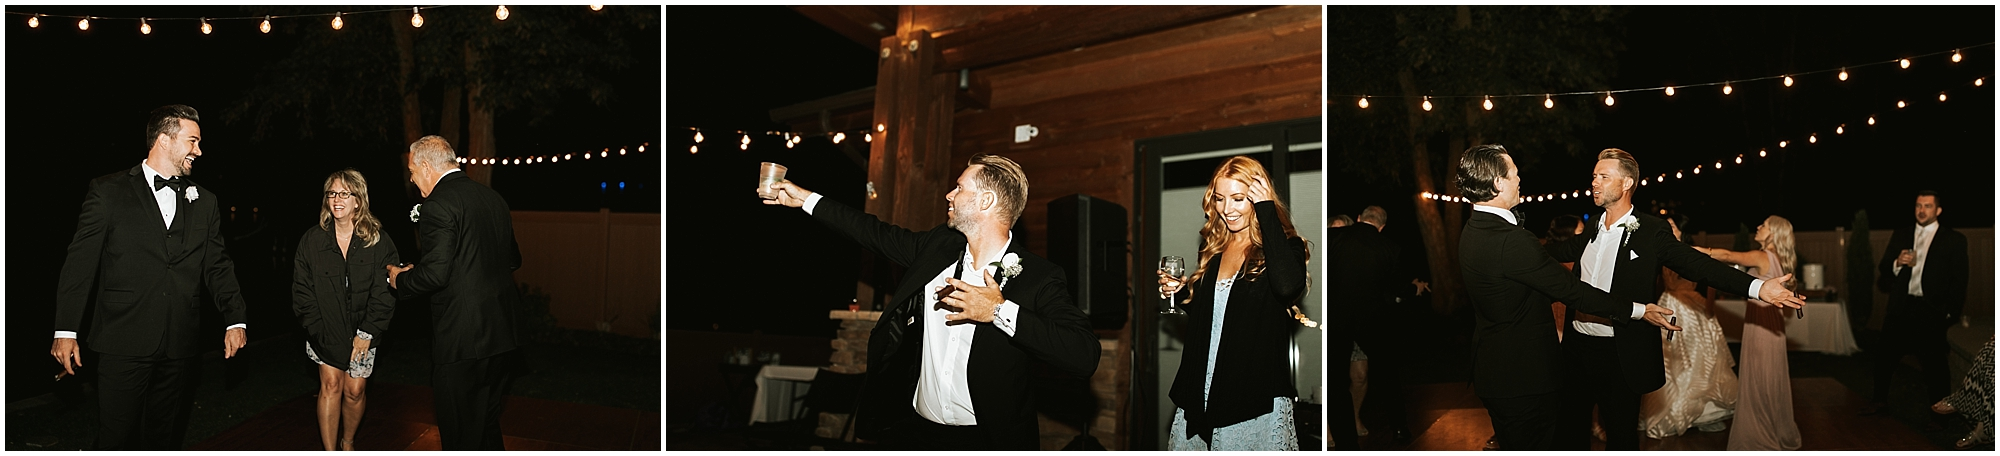 Idaho Lake Wedding Cassie Trottier Photography1142.jpg